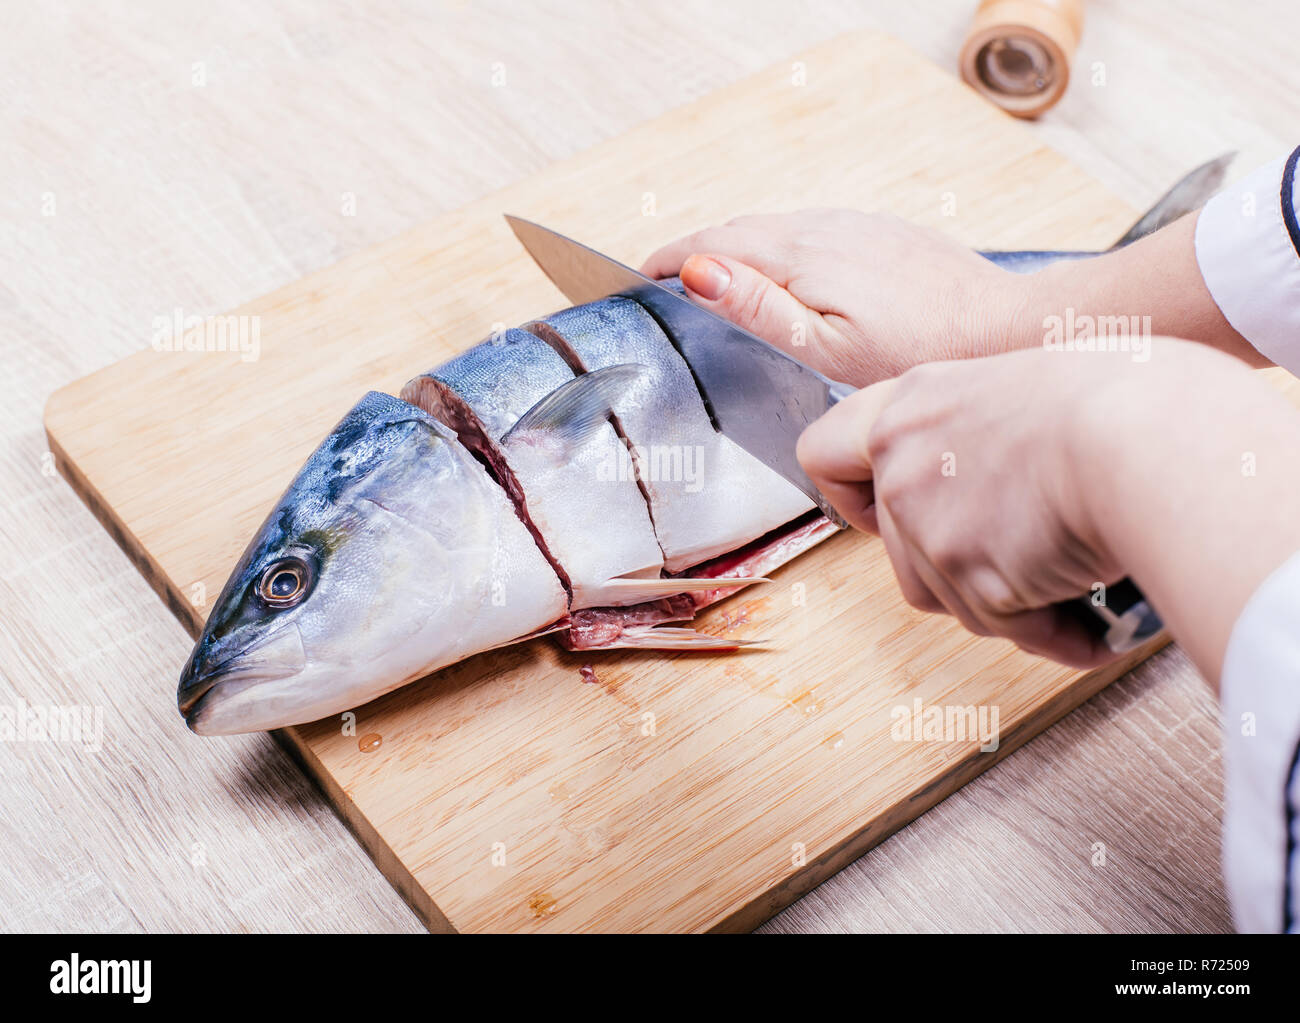 Cook Cuts Raw Tuna Fish Hands Closeup Stock Photo Alamy